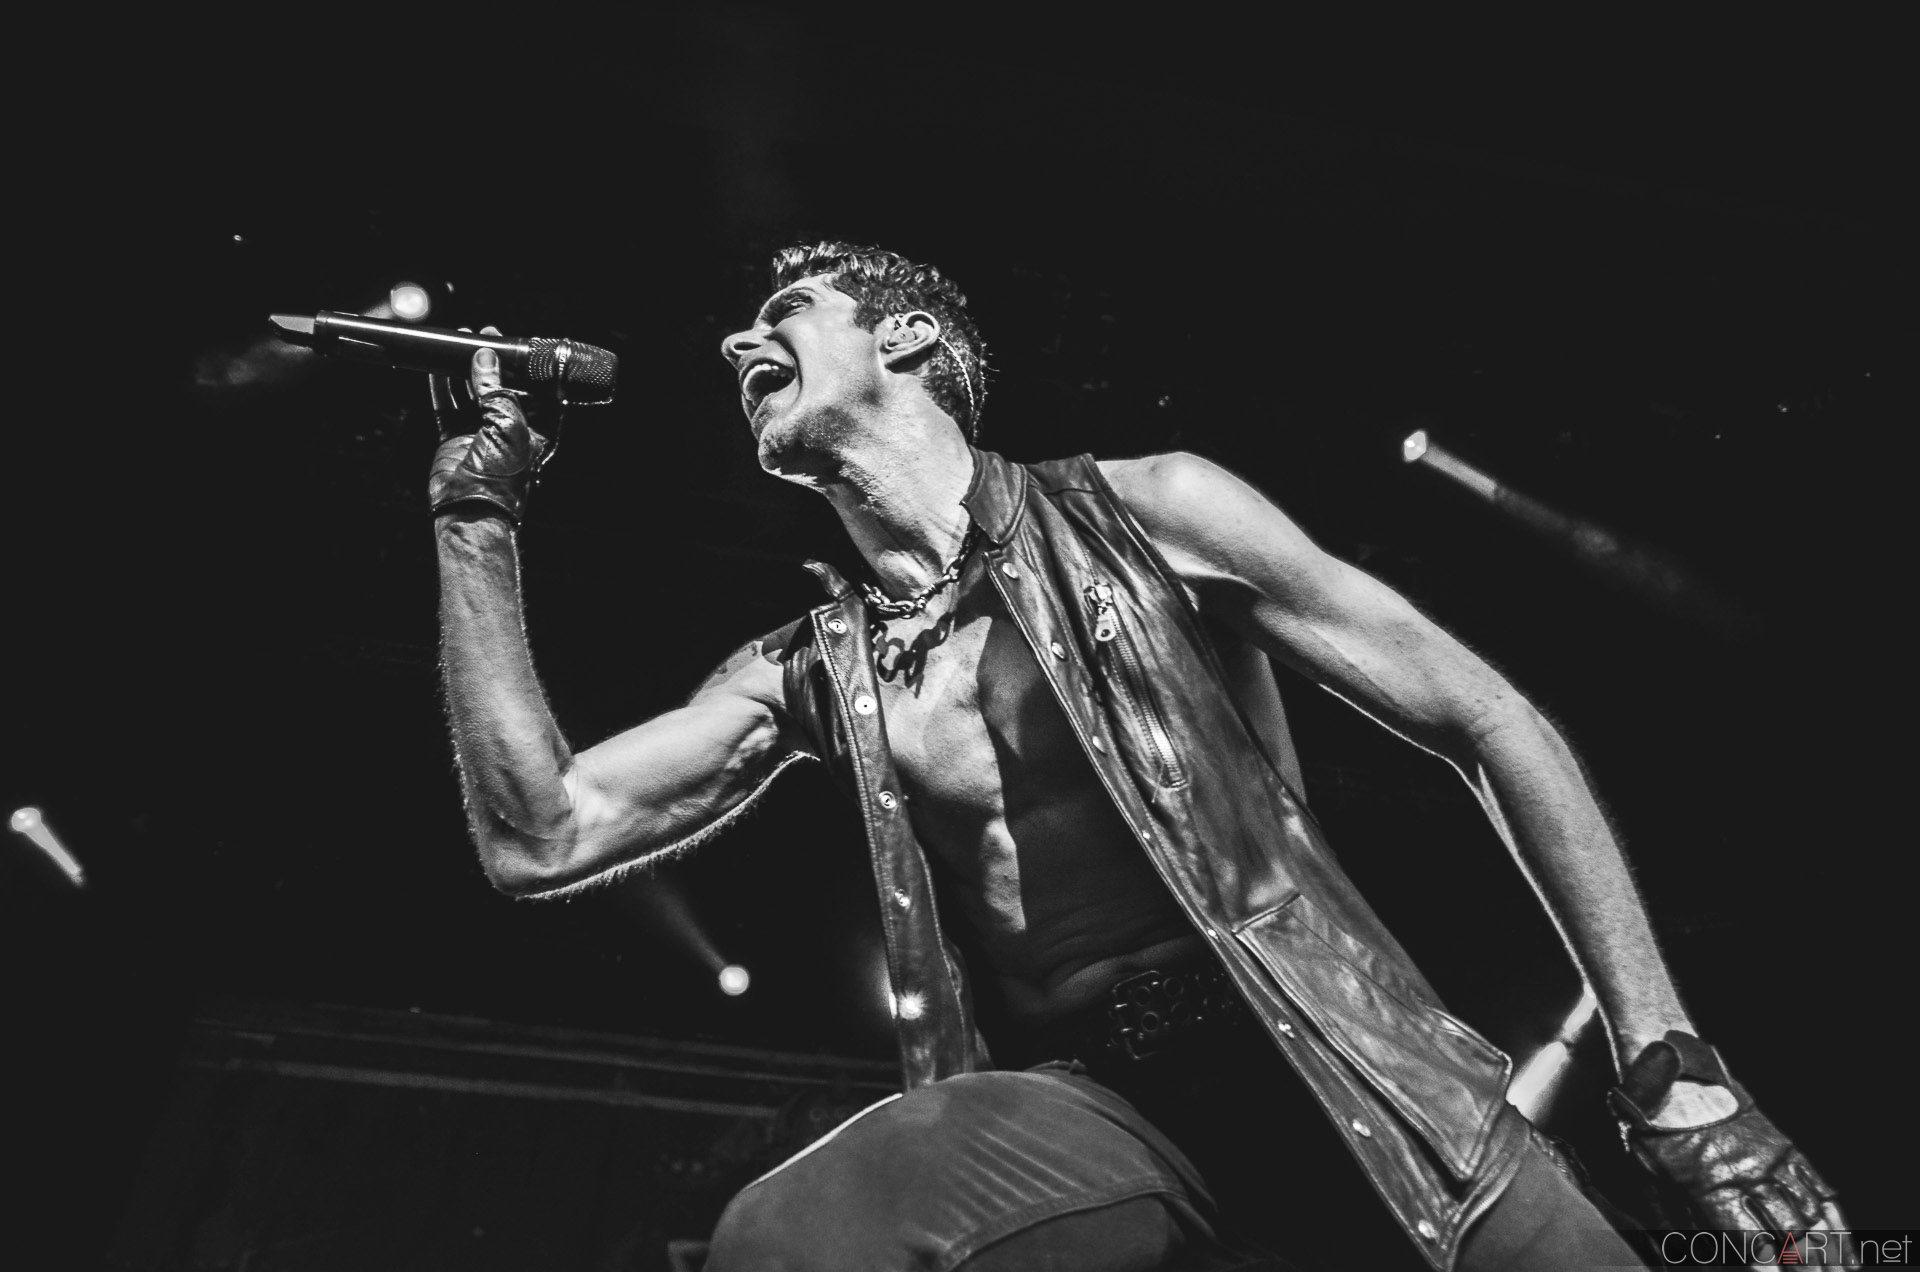 janes_addiction_live_x103_rockstar_uproar_festival_klipsch_indianapolis_2013-03